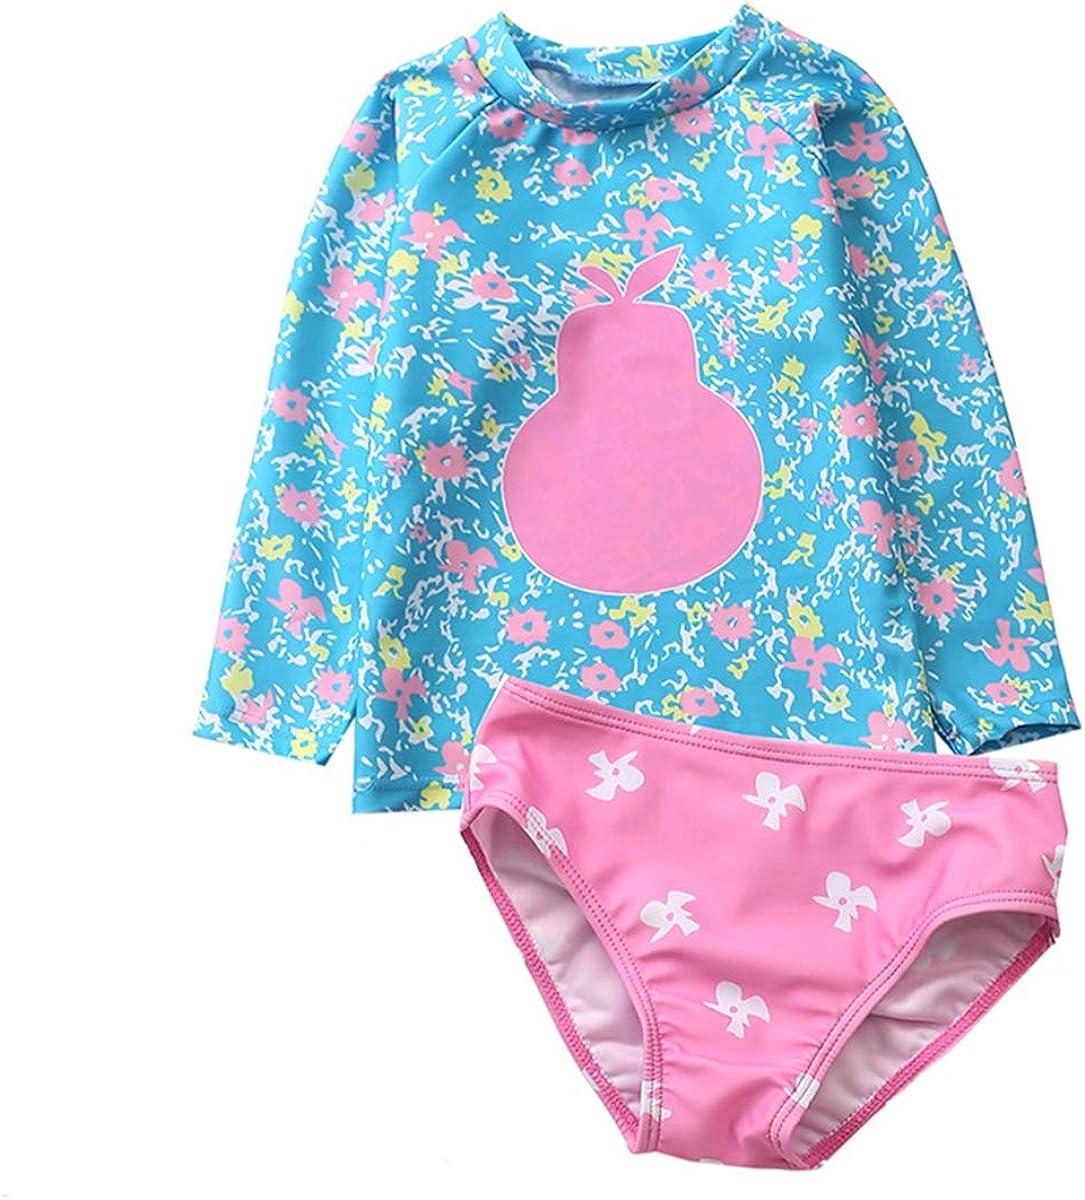 Infant Baby Girls Flamingo Rash Guard Sets Girl Polka Dot Swimwear Long Sleeve Swimsuit UPF 50+